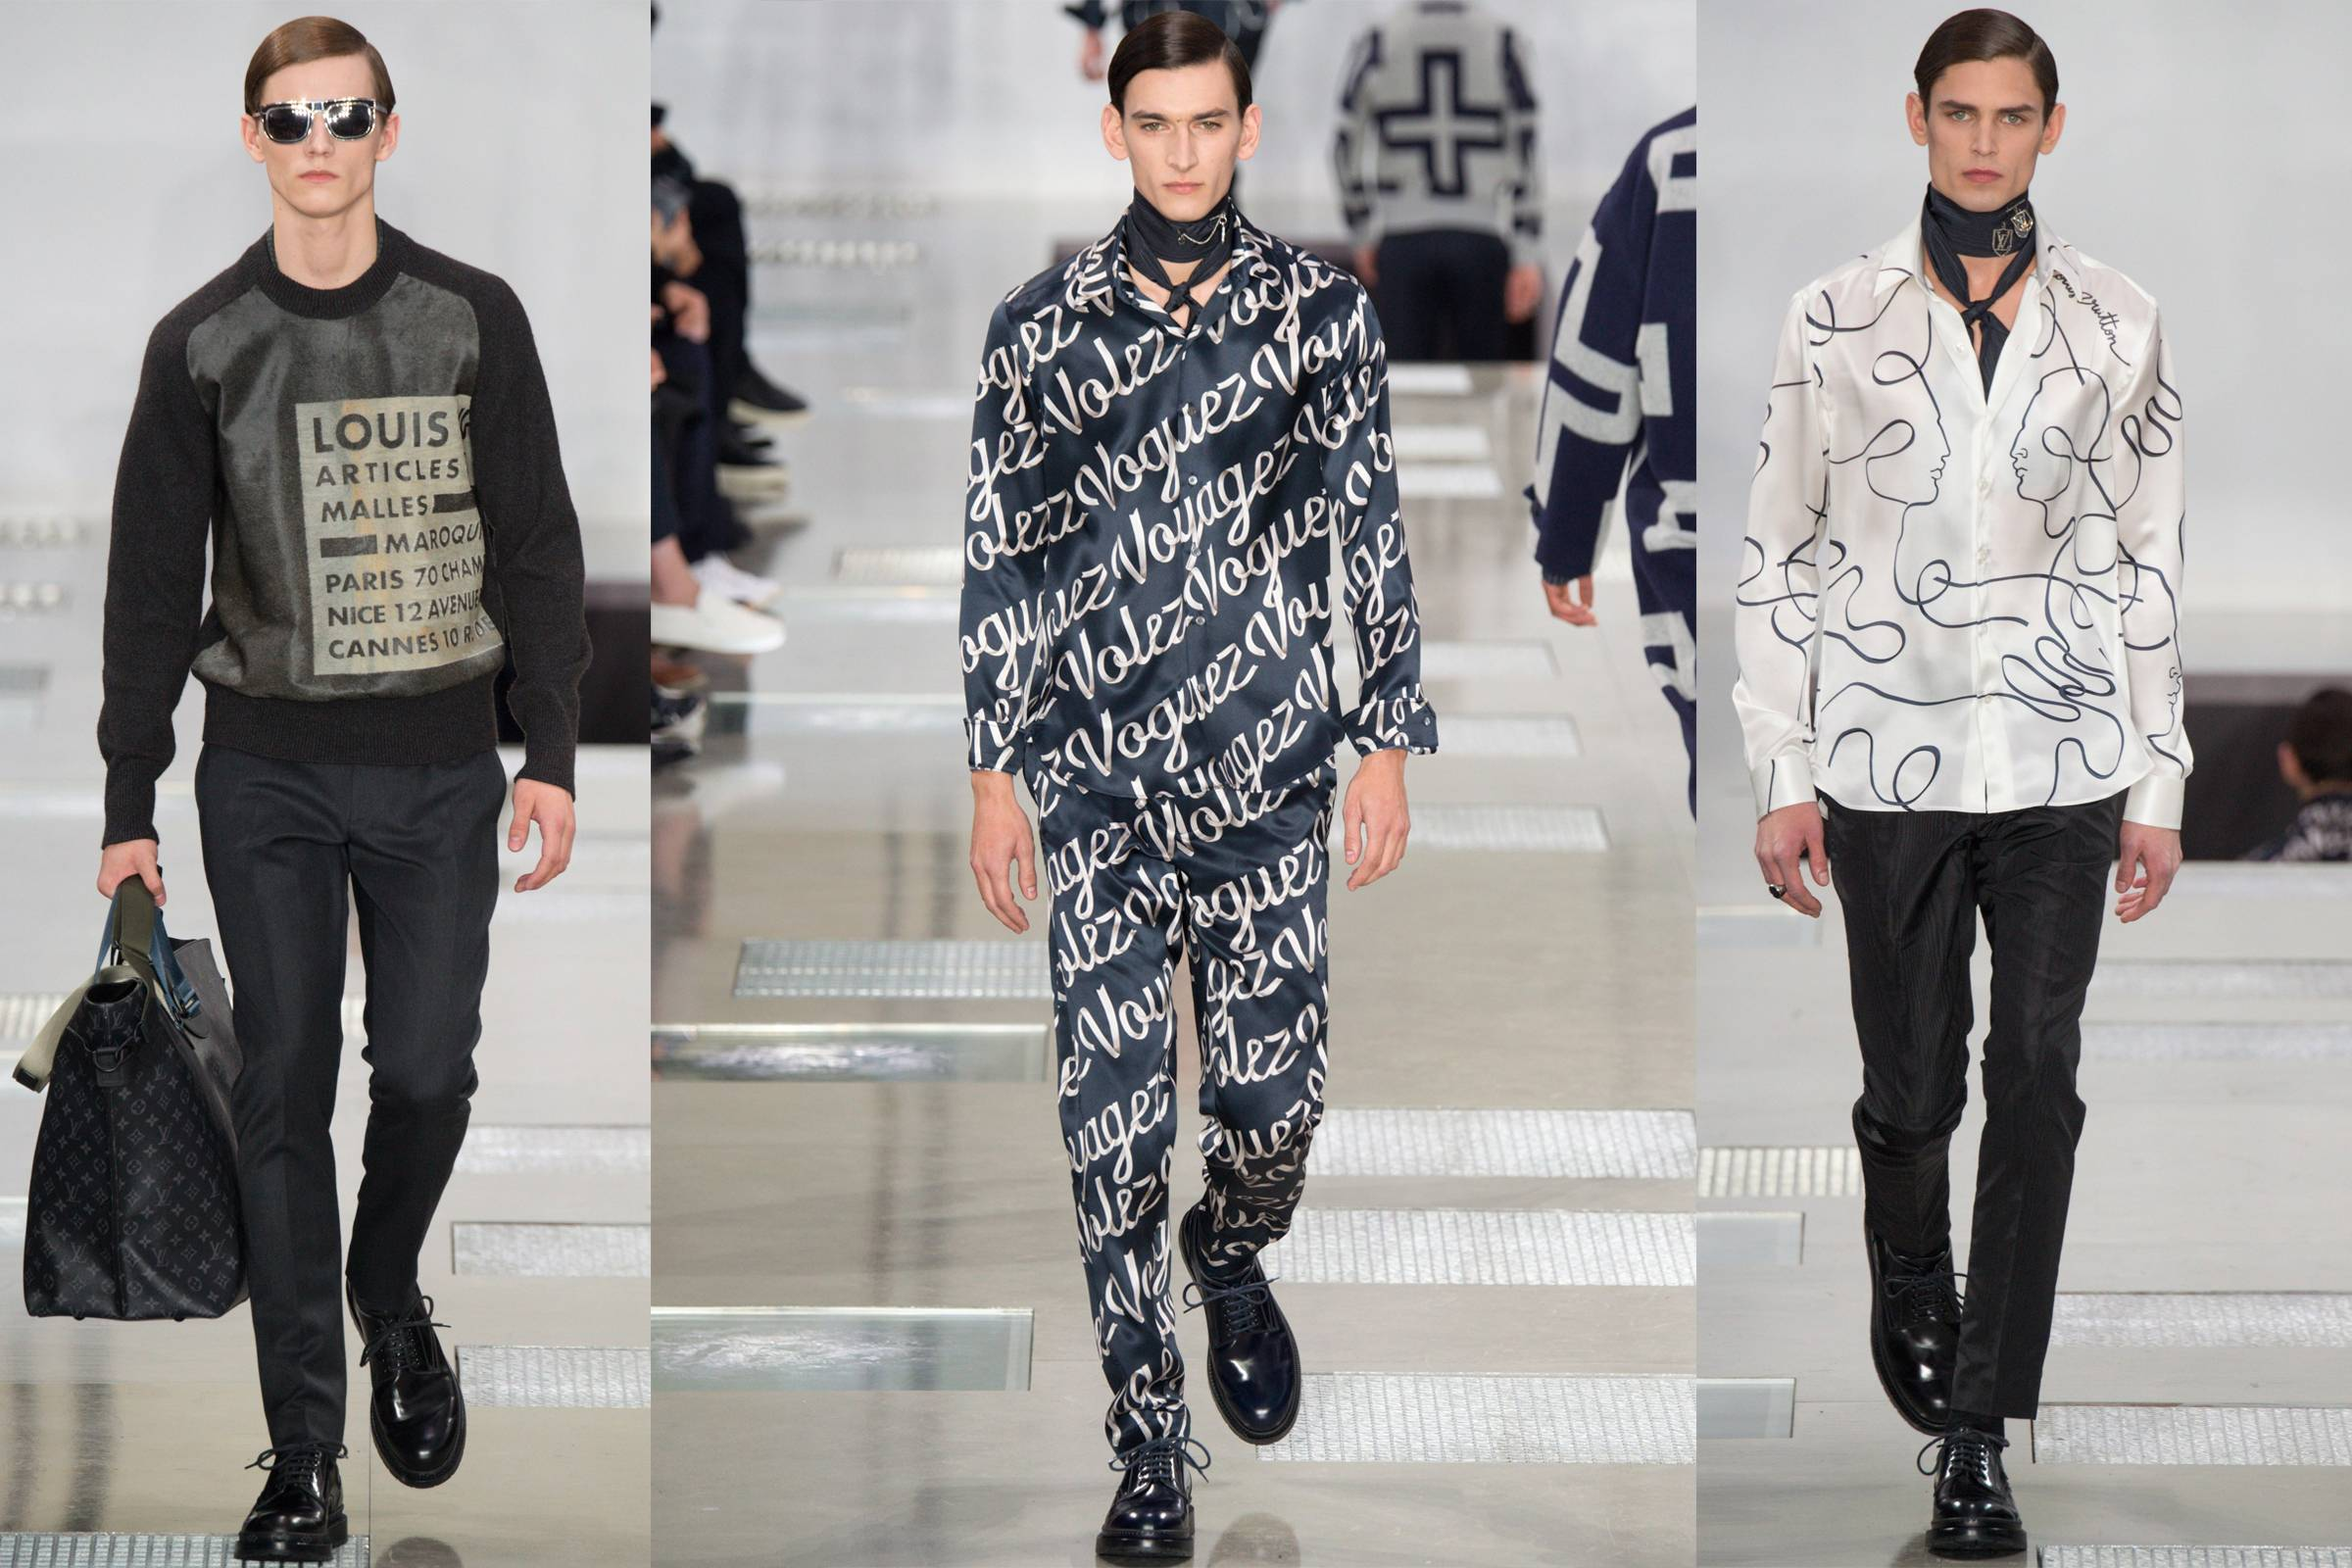 Louis Vuitton Fall/Winter 2016